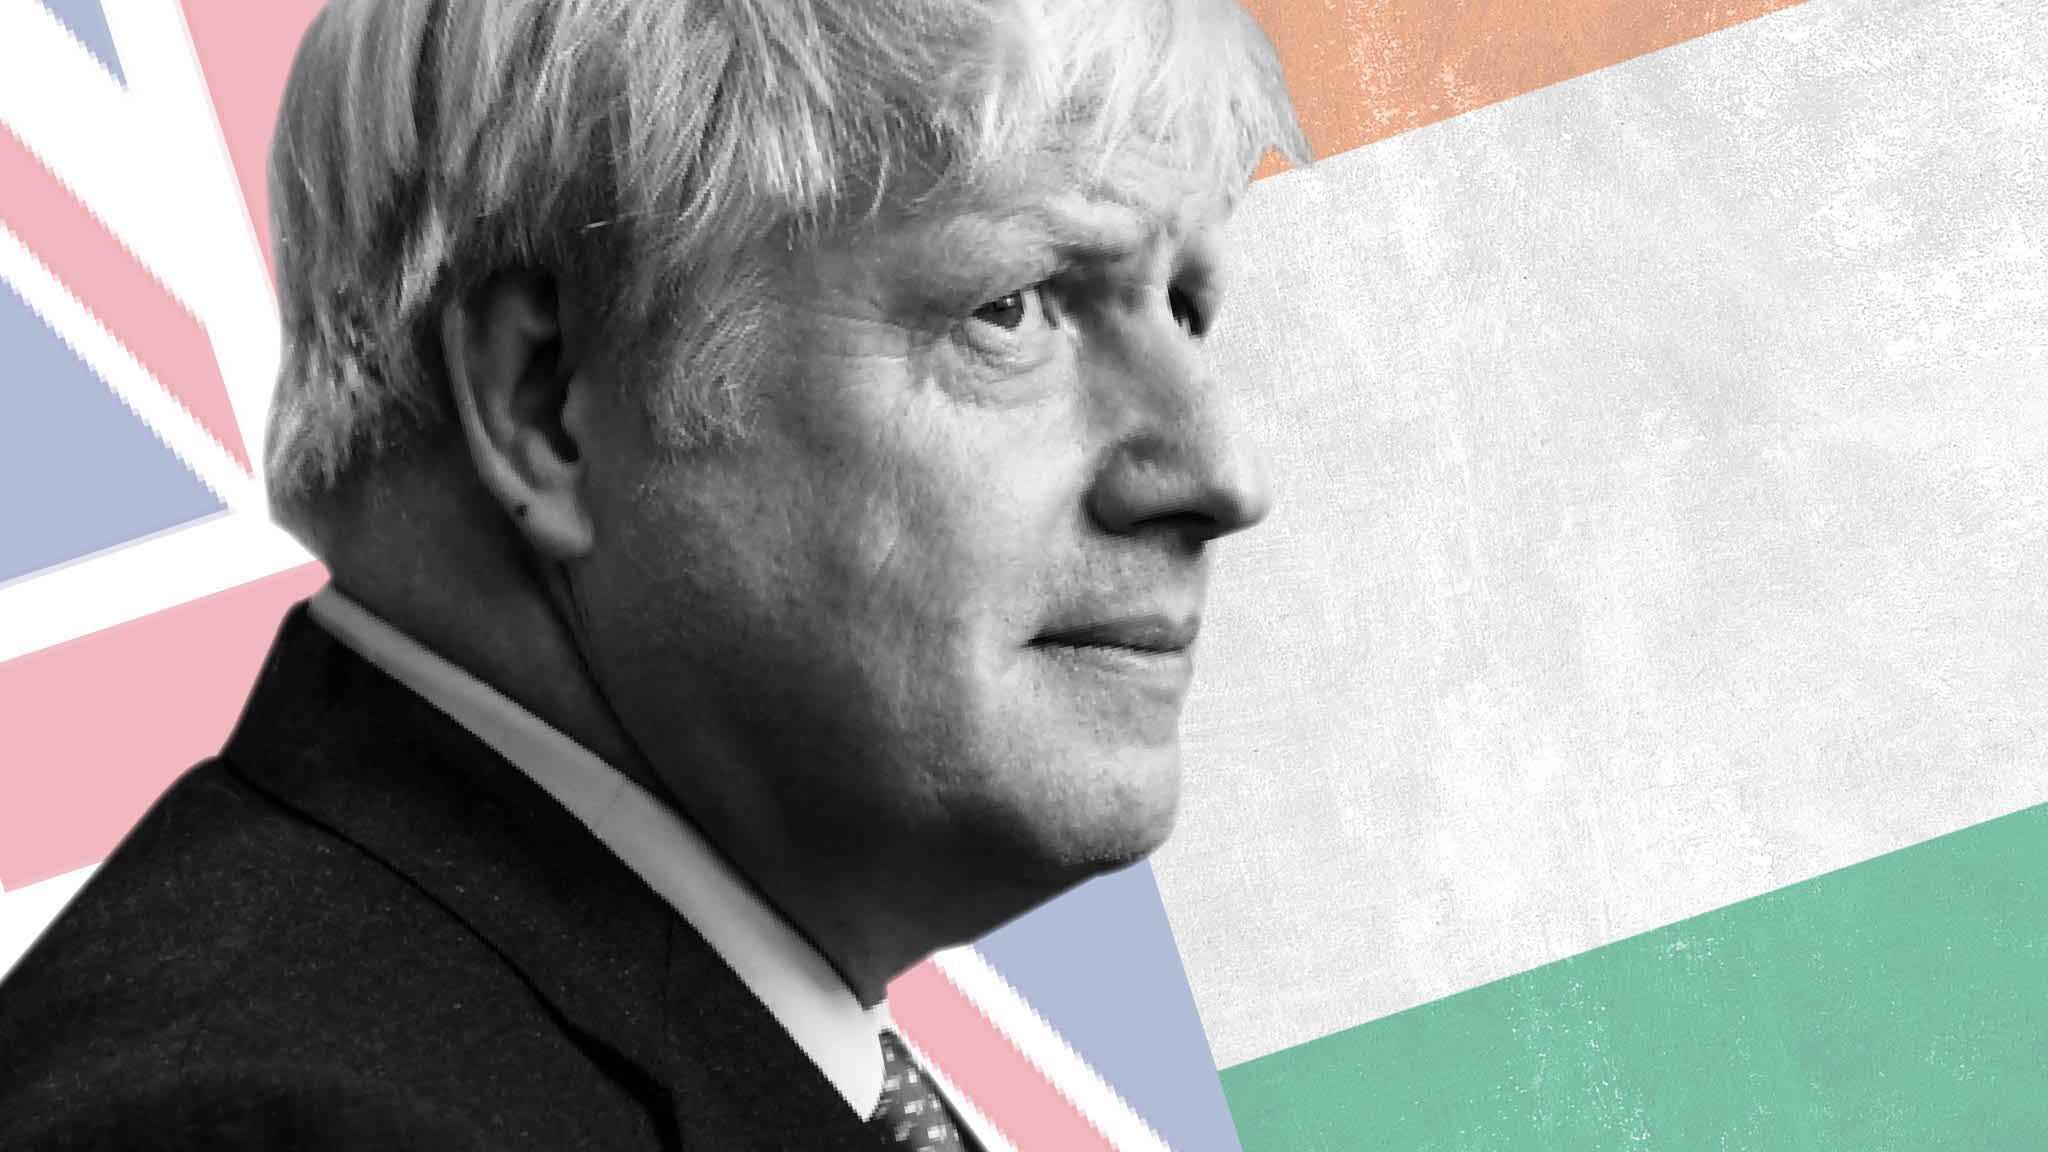 Boris Johnson eyes special Northern Ireland zone to end impasse